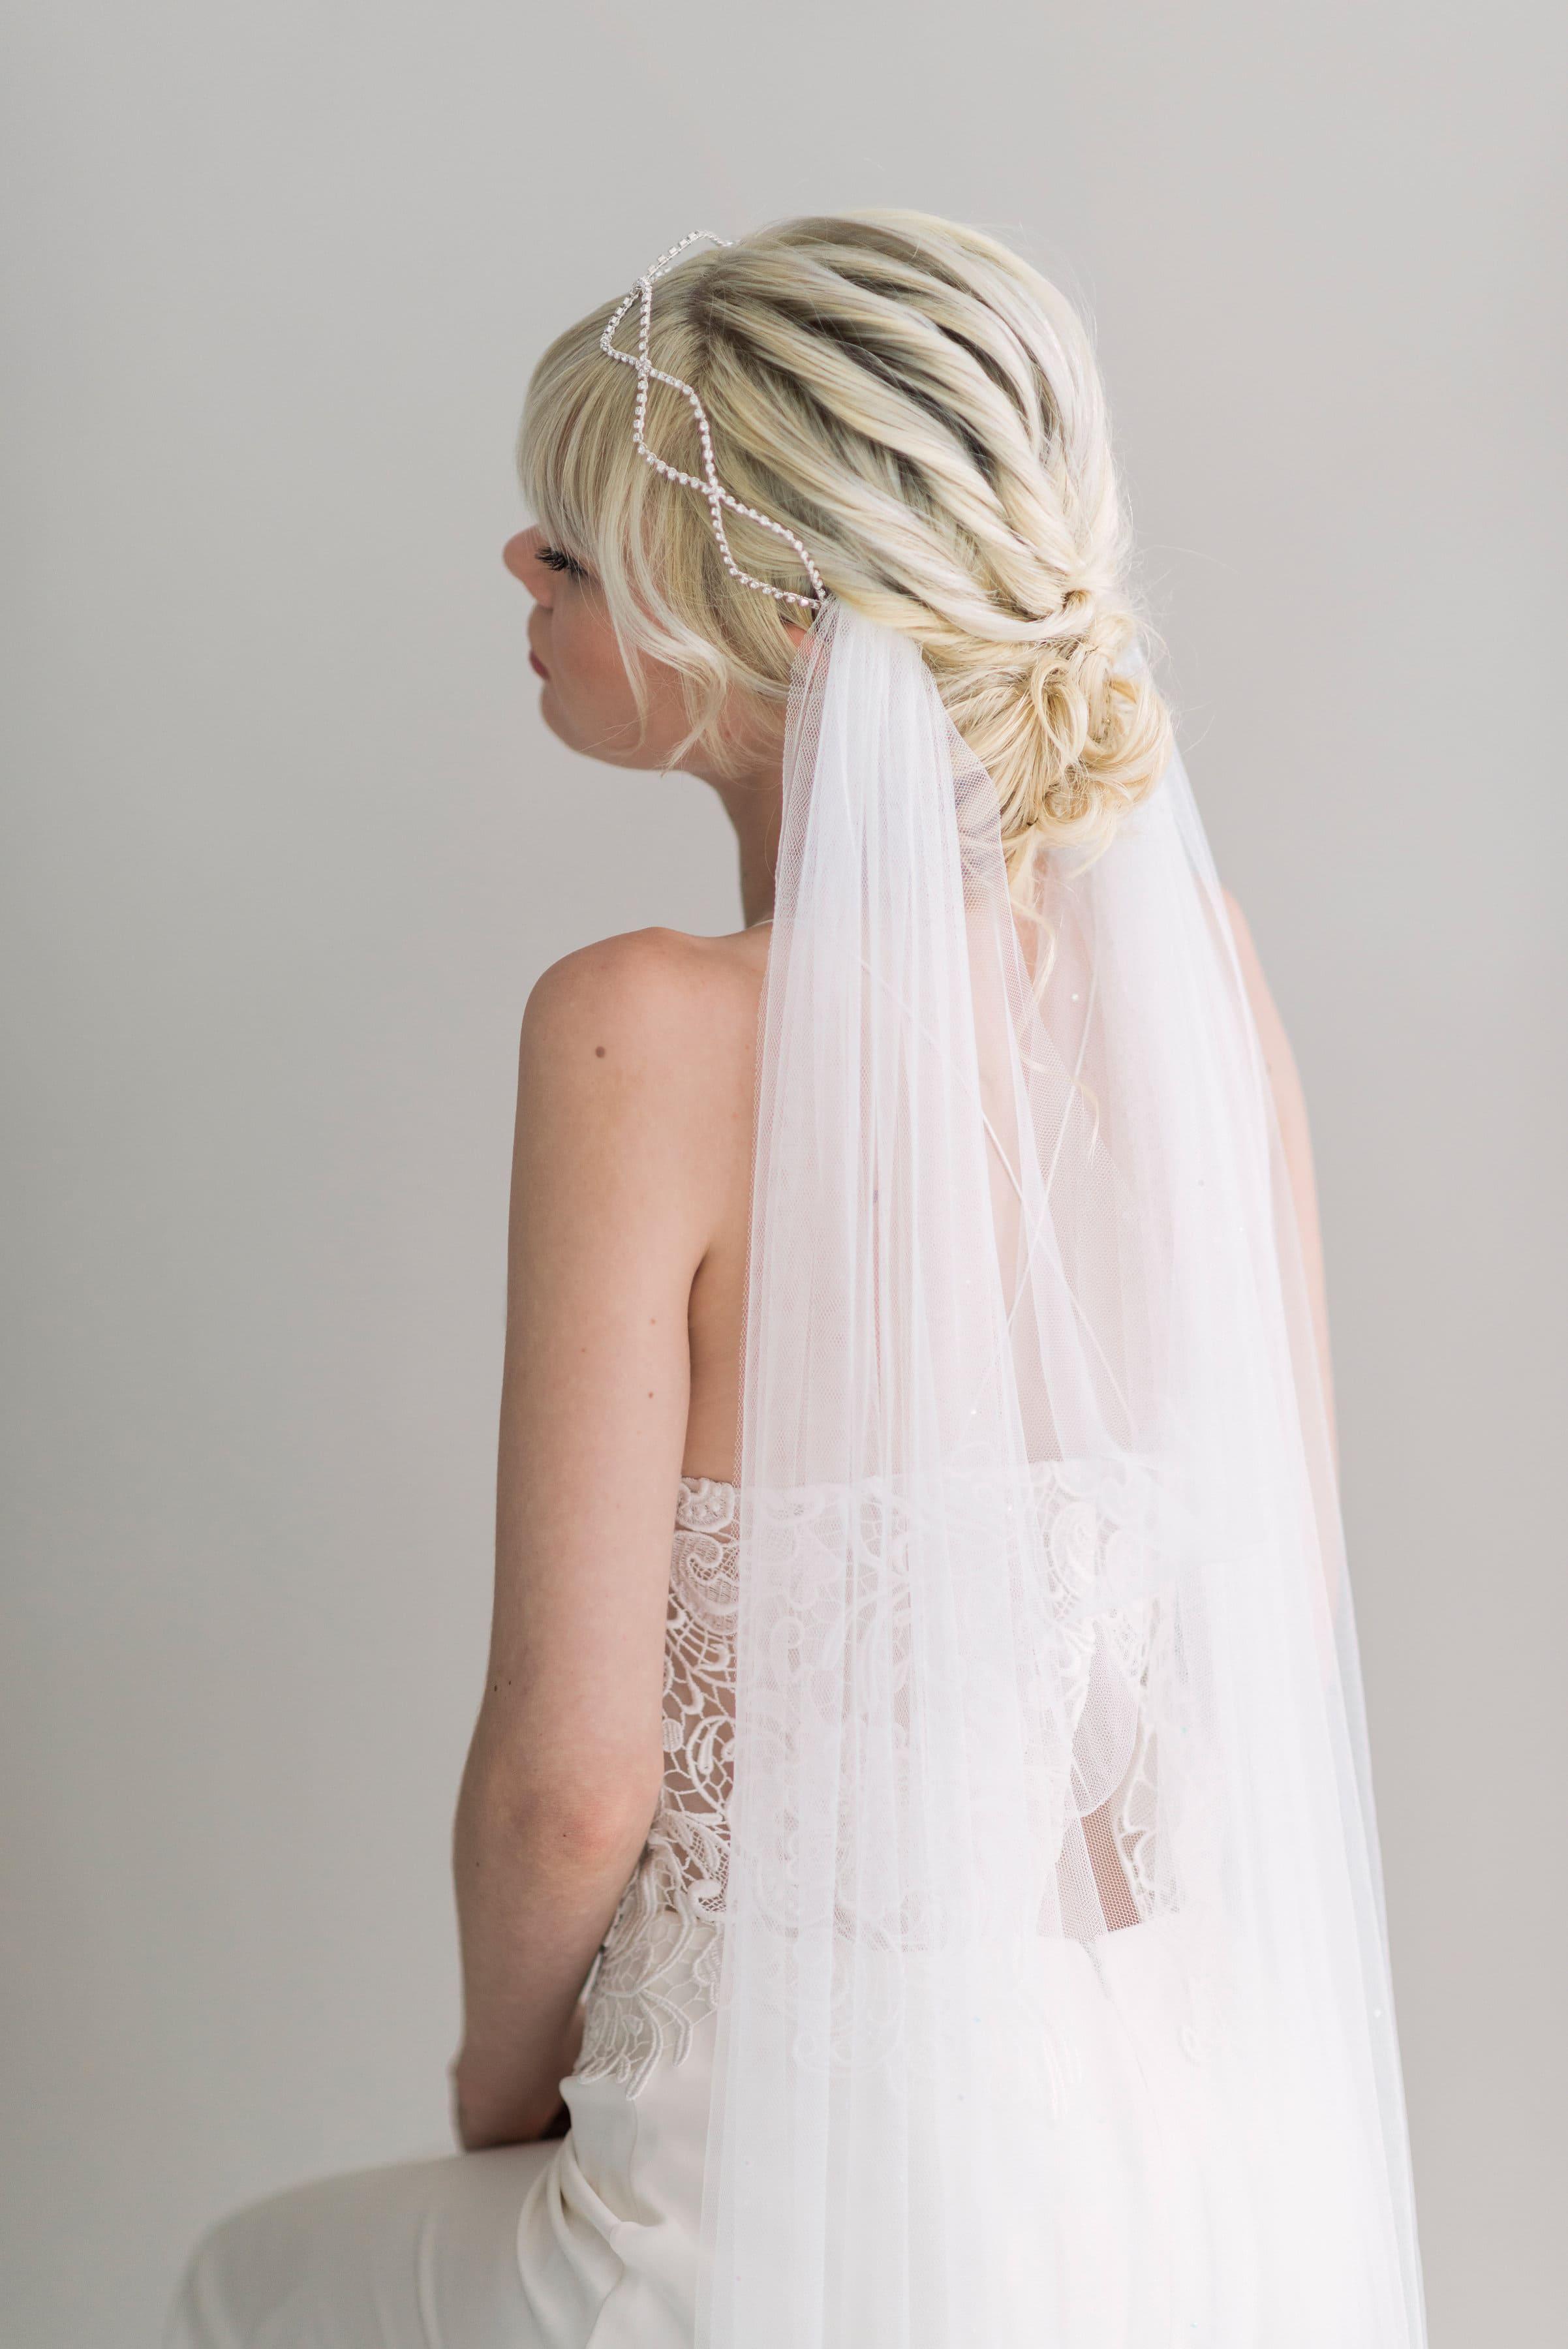 Amelia Draped Crystal Wedding Veil Sash And Veil Artisan Veil Maker